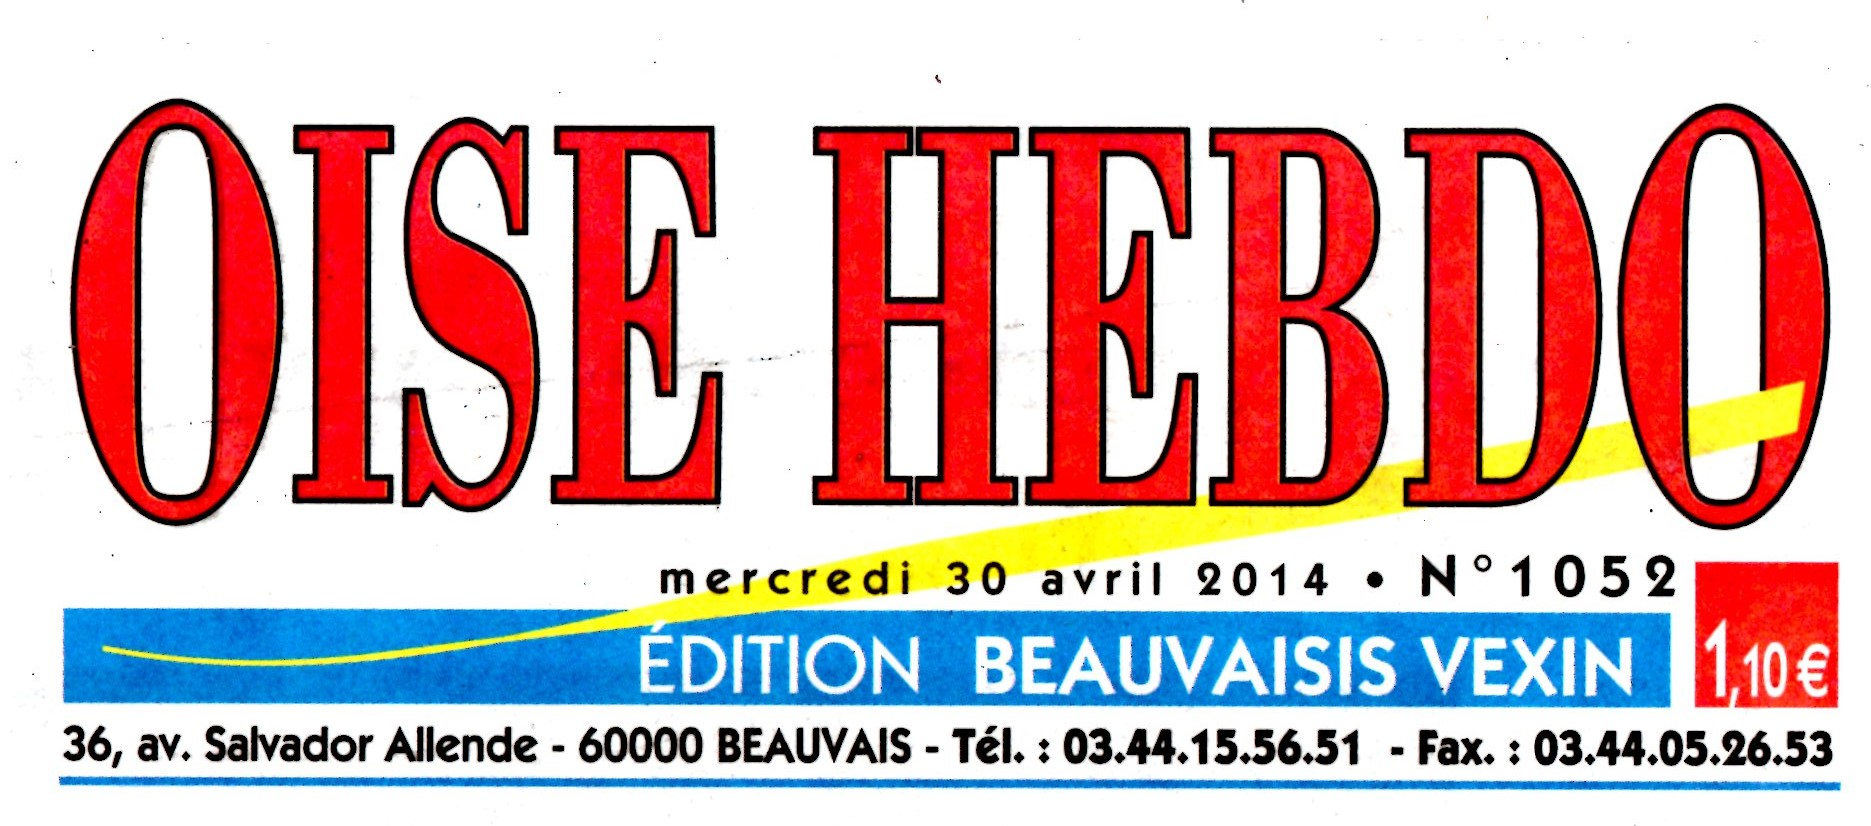 L OISE HEBDO 30 AVRIL 2014